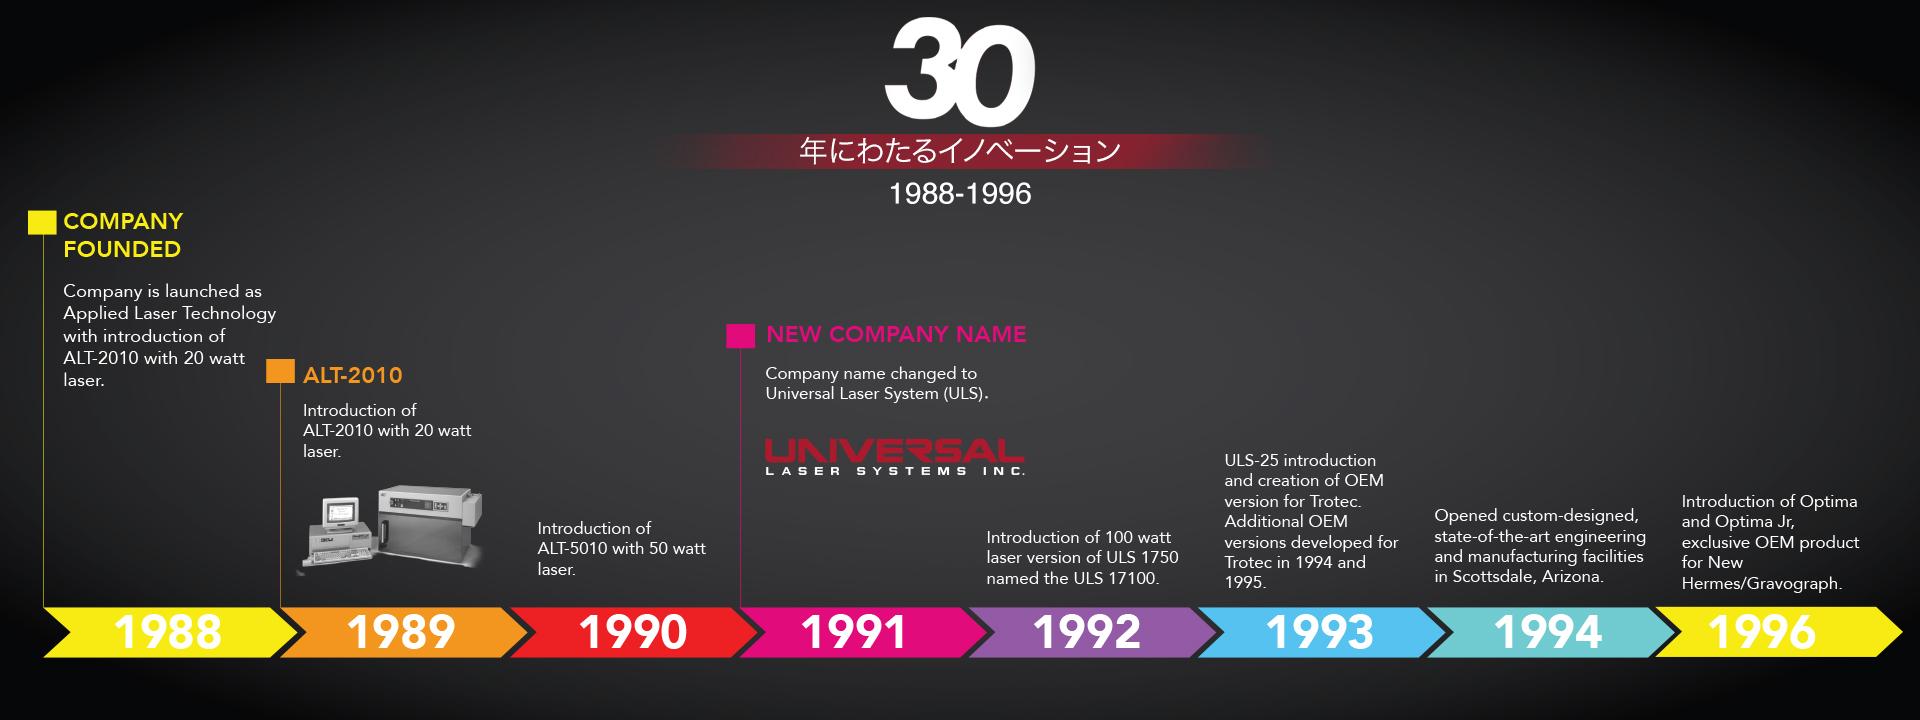 ULS Japanese Timeline 1